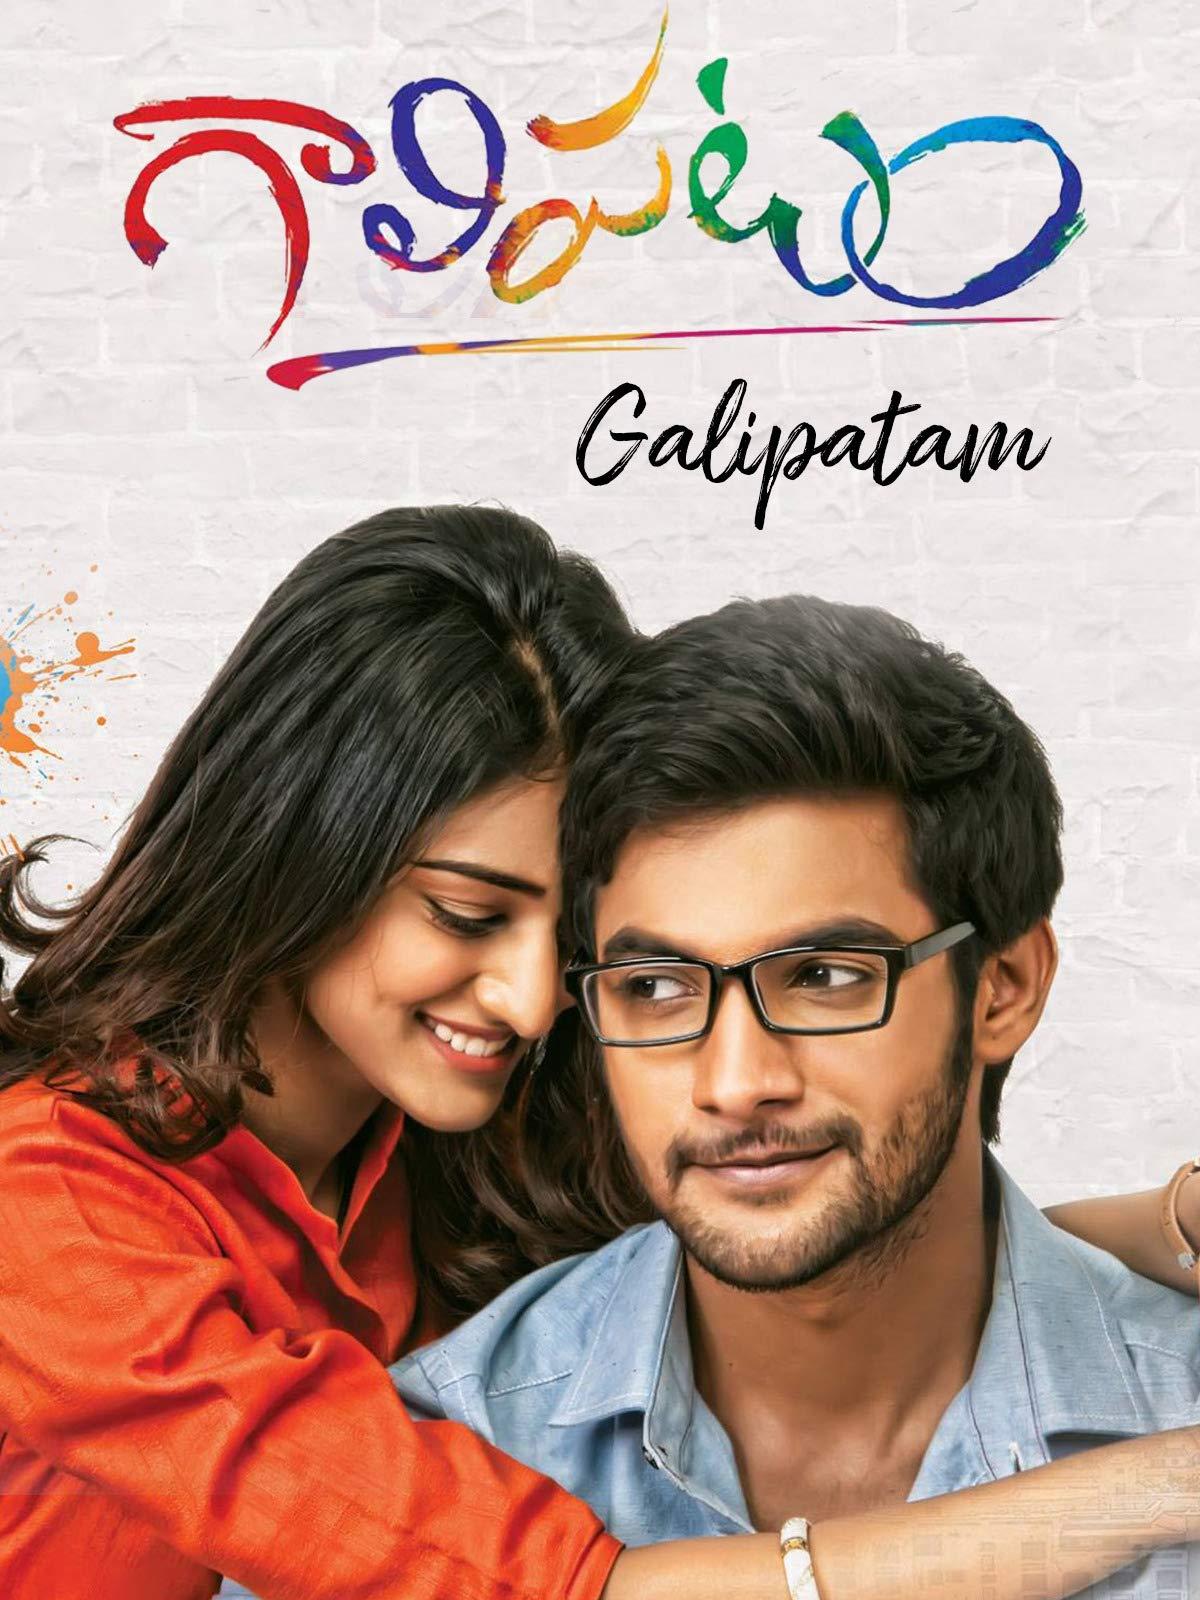 Galipatam Untold Love Story 2020 Hindi Dubbed 1080p HDRip 2.7GB Free Download